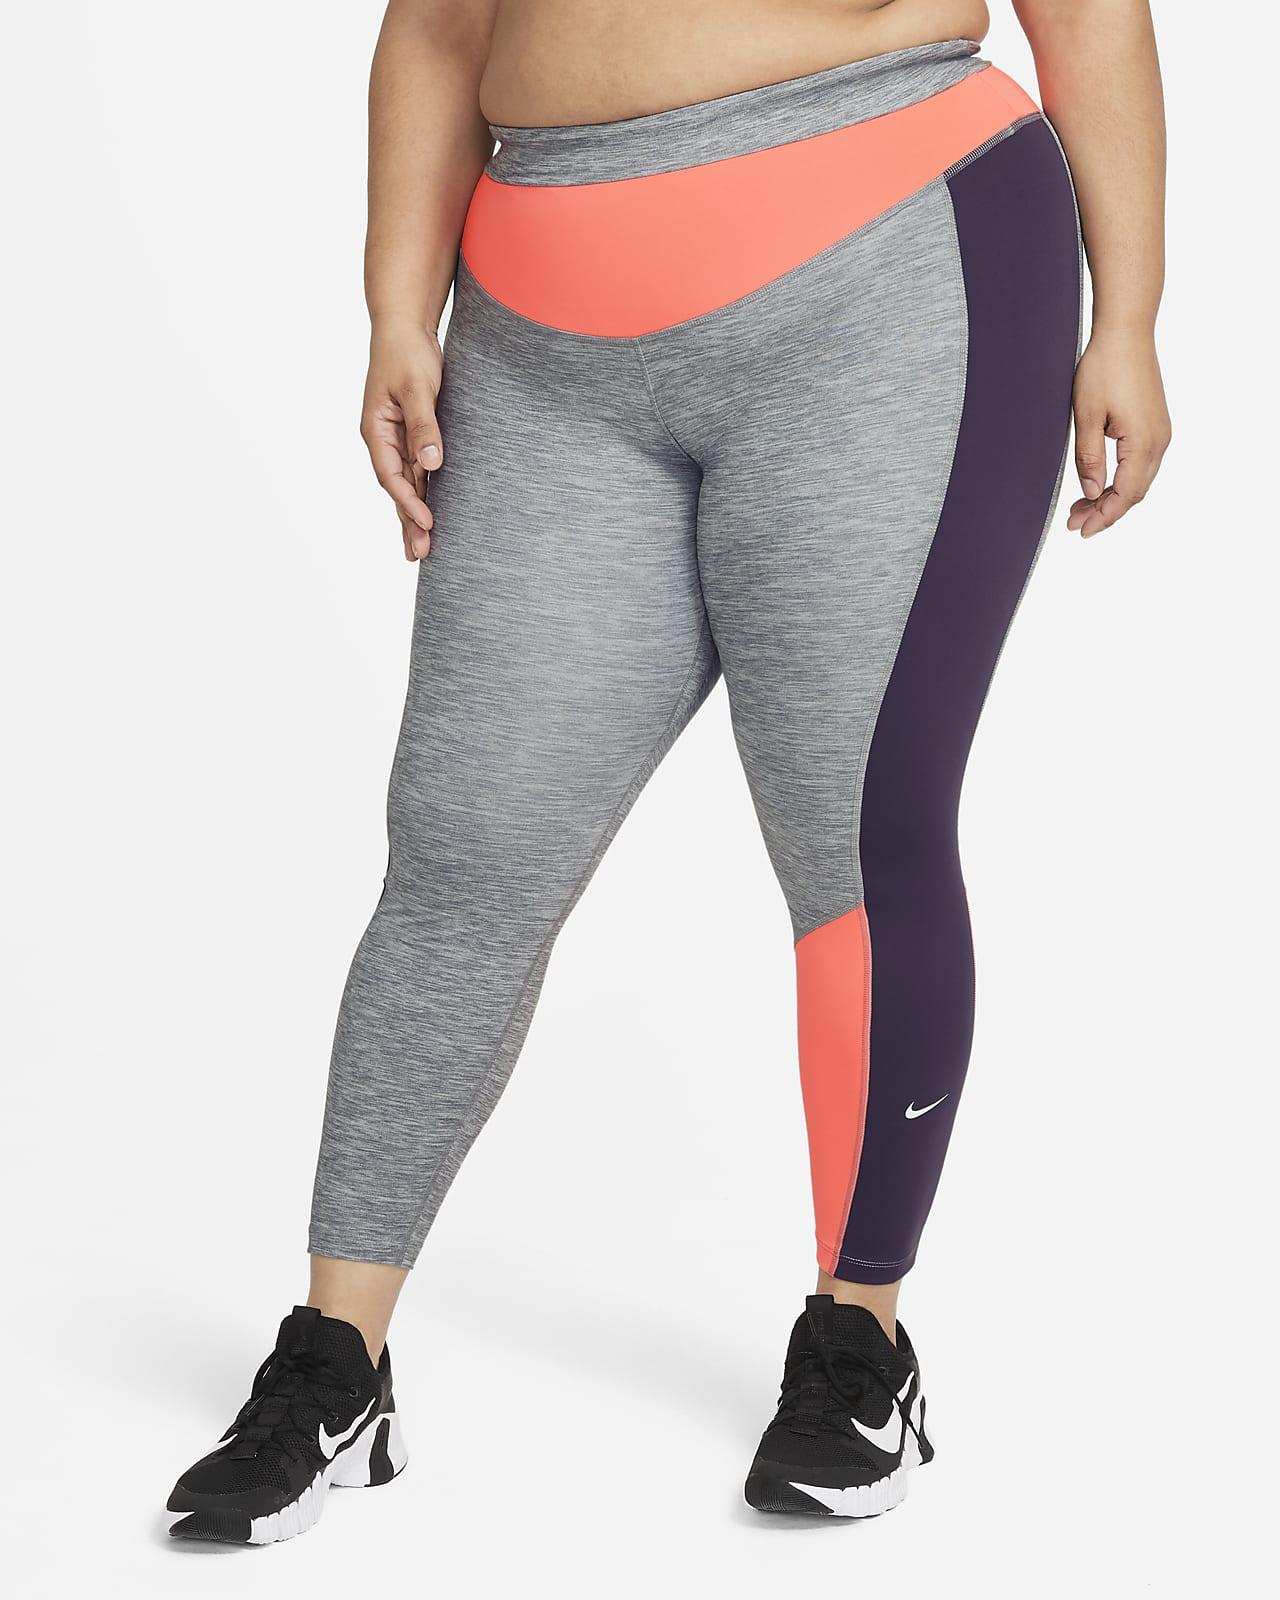 Nike One Women's 7/8 Heathered Colour-Block Leggings (Plus Size)